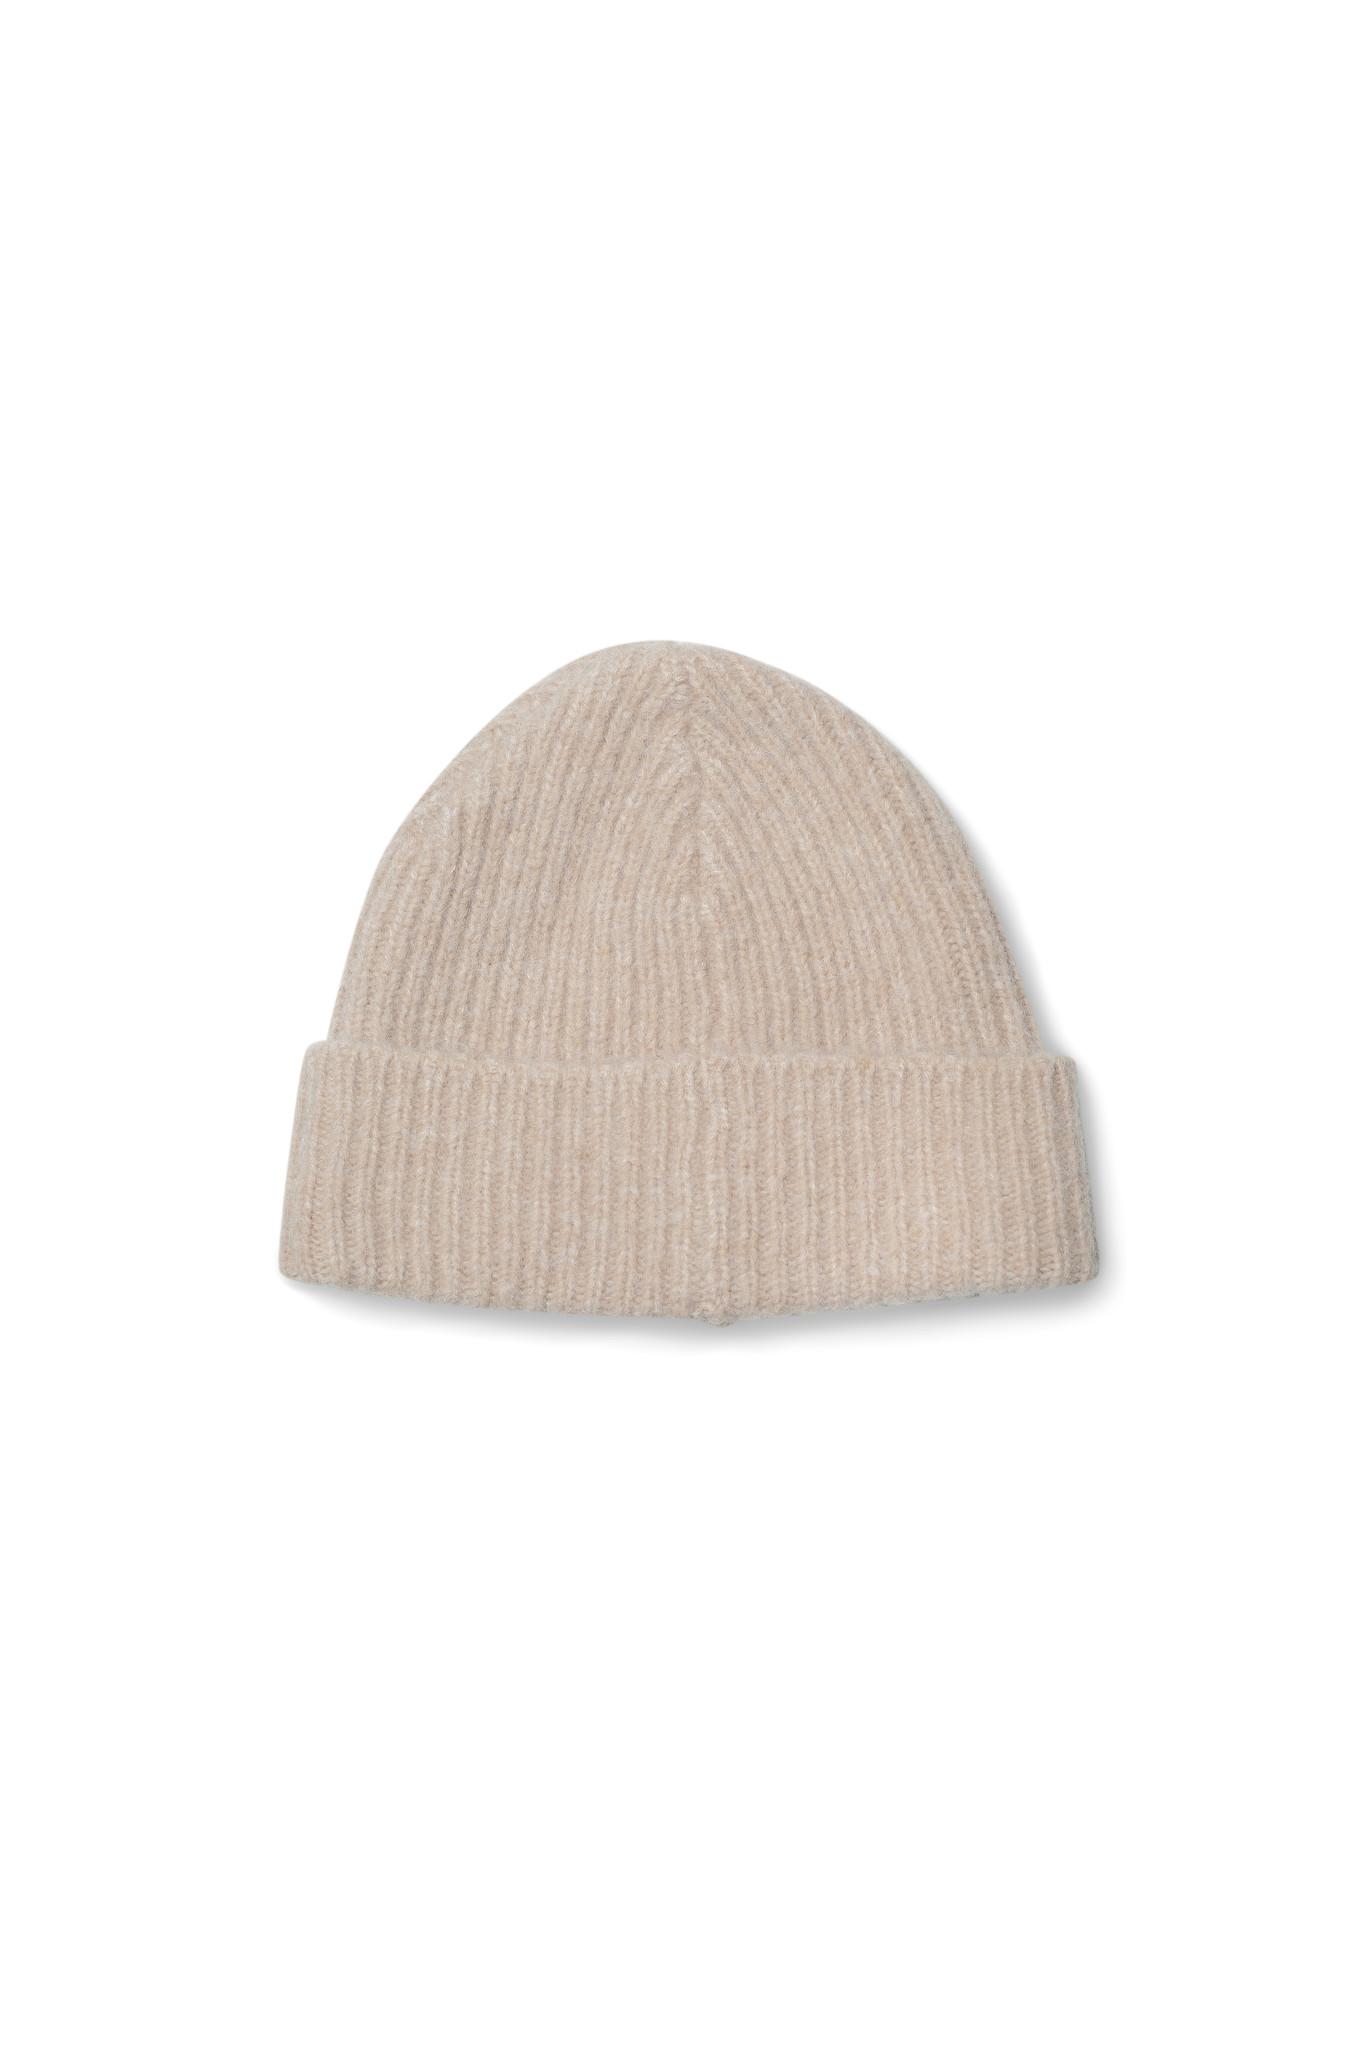 Berg Hat - Camel-2